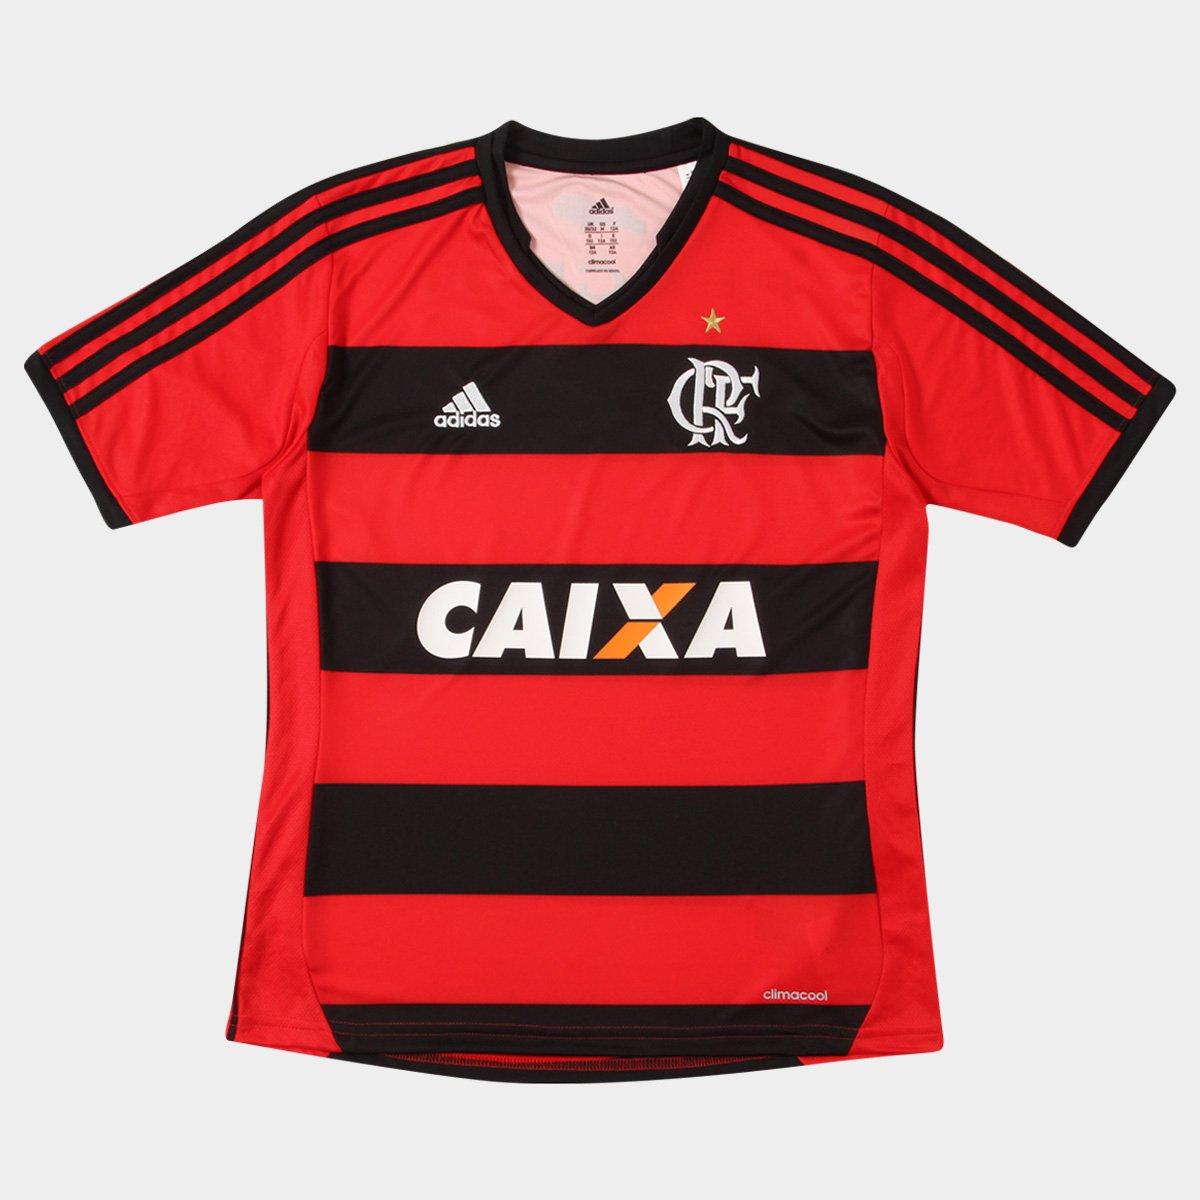 Camisa Adidas Flamengo I 13 14 s nº Infantil - Compre Agora  f8ecad0815c95